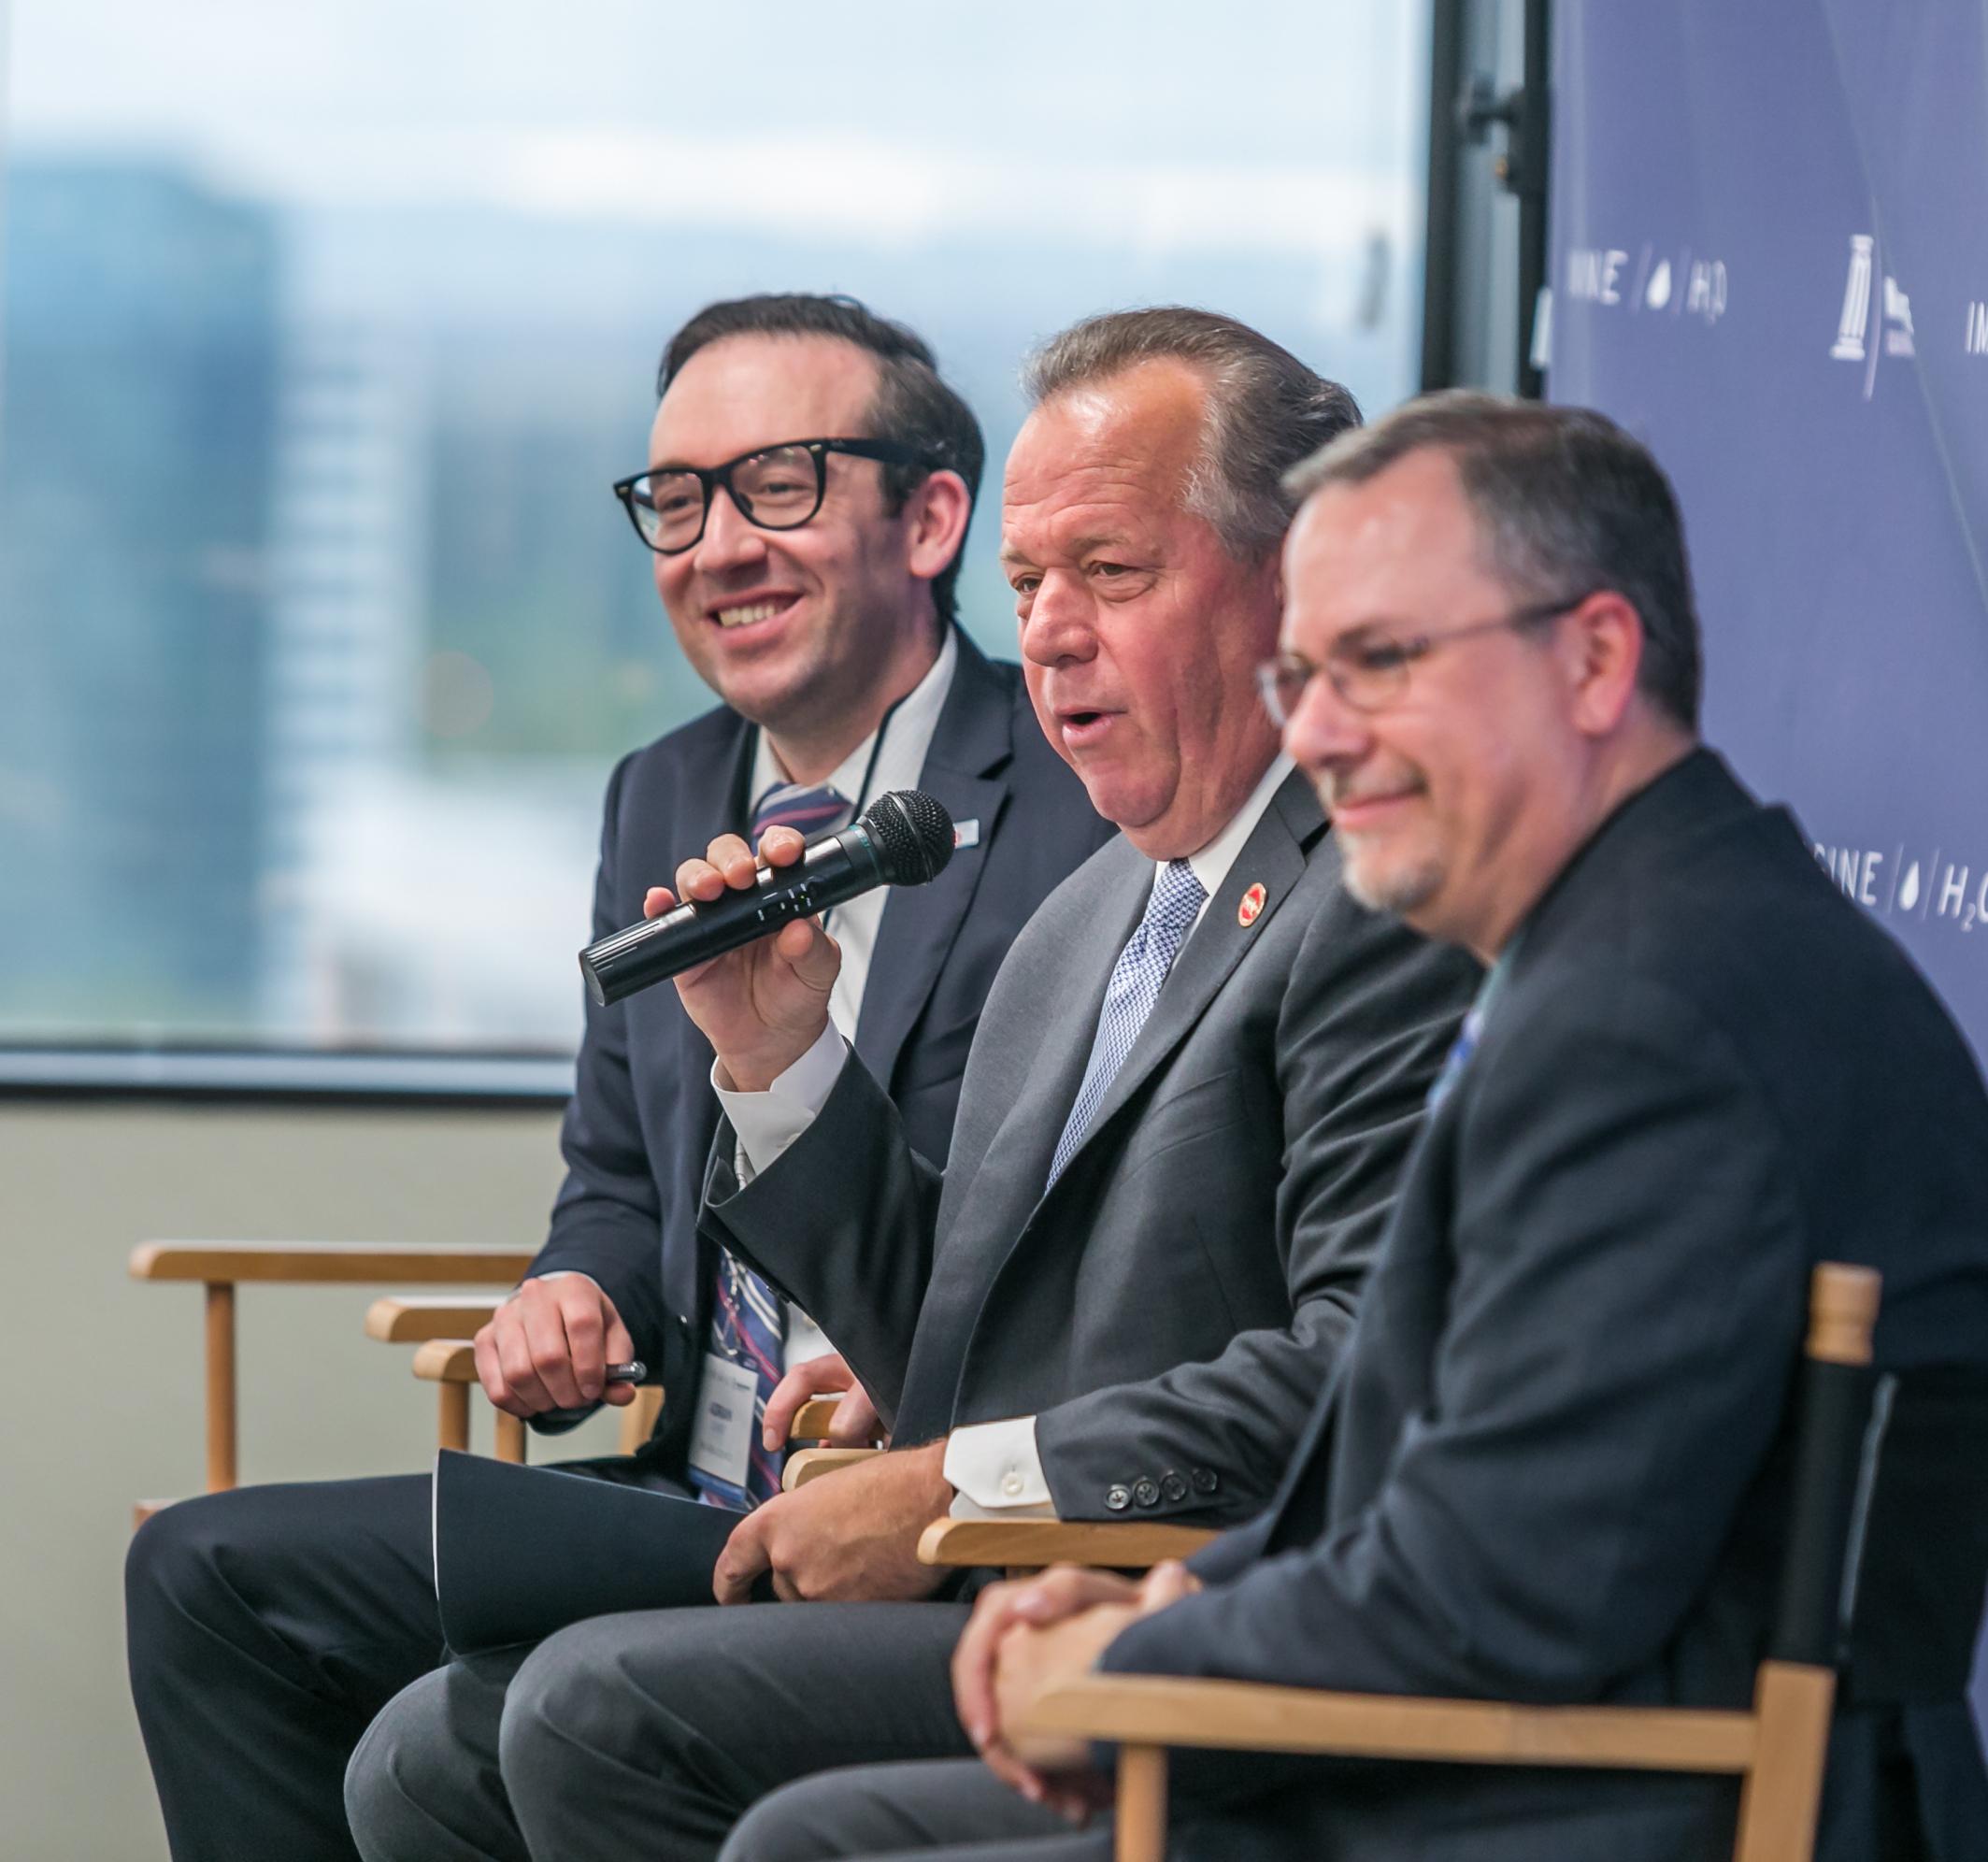 Adrian Covert, Bay Area Council; Senator Dodd; Mike Myatt, Water Foundation